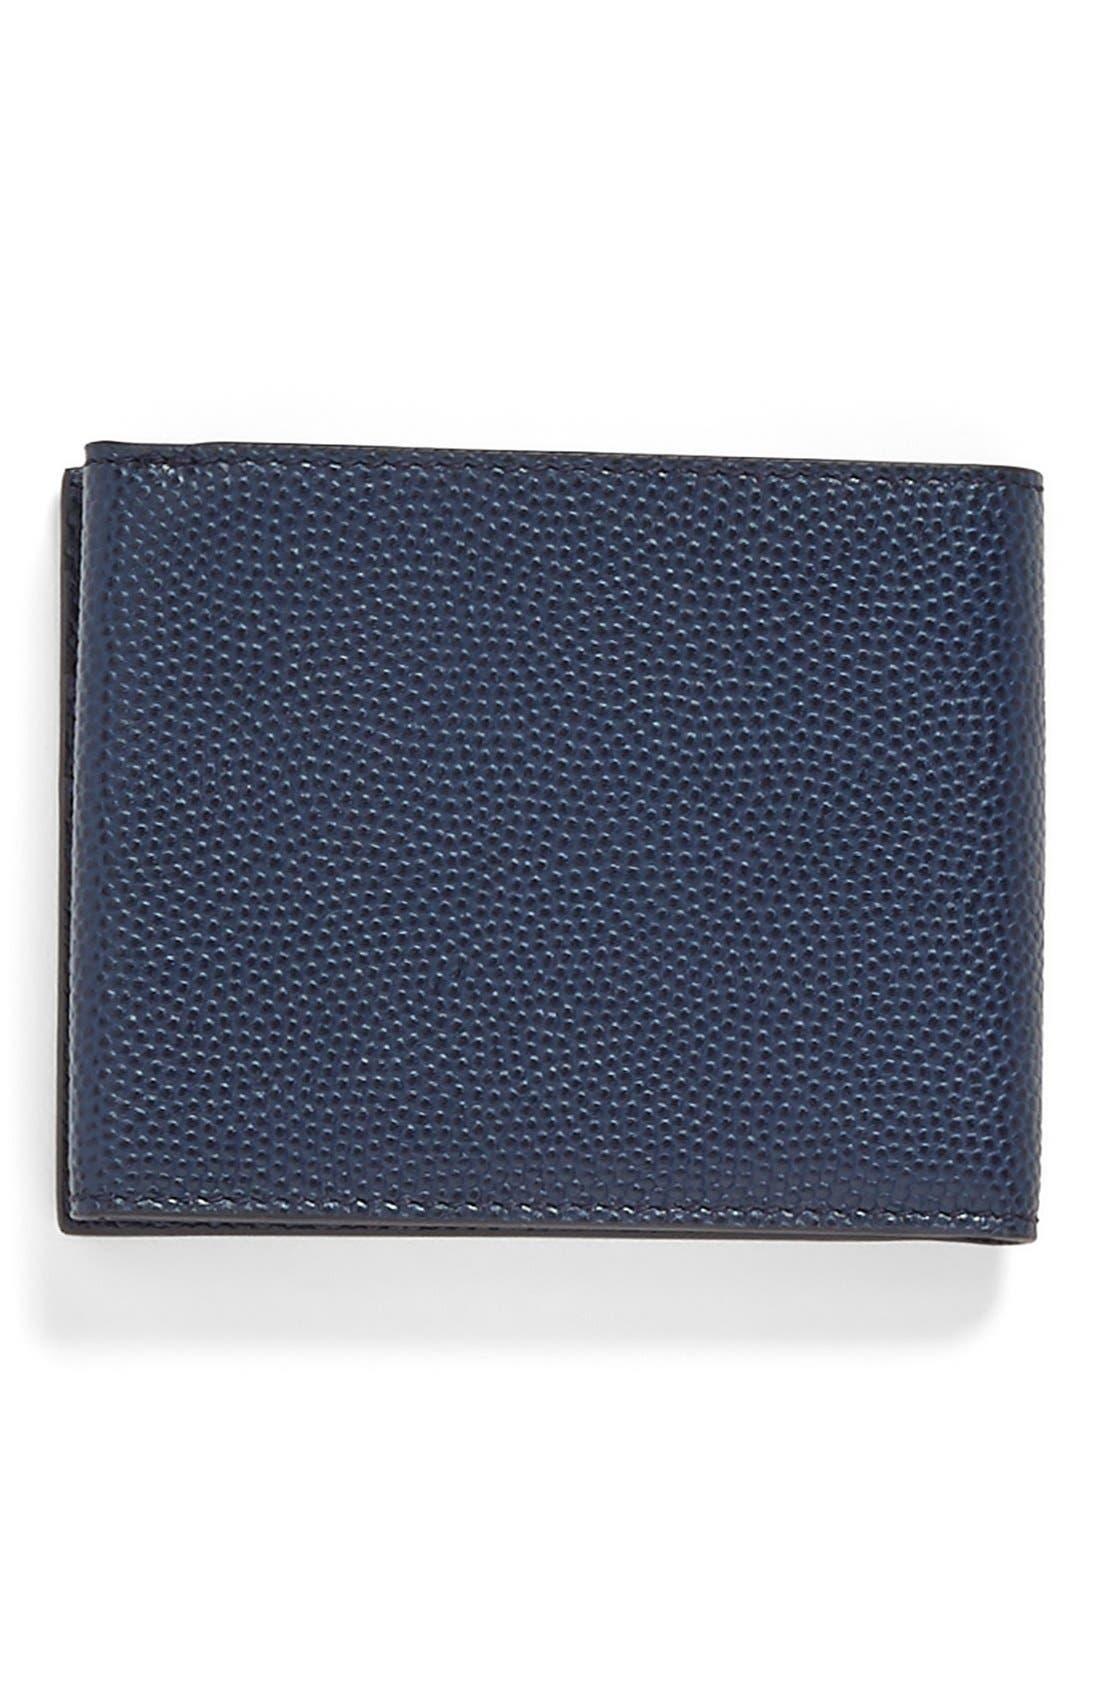 Trifold Wallet,                             Alternate thumbnail 3, color,